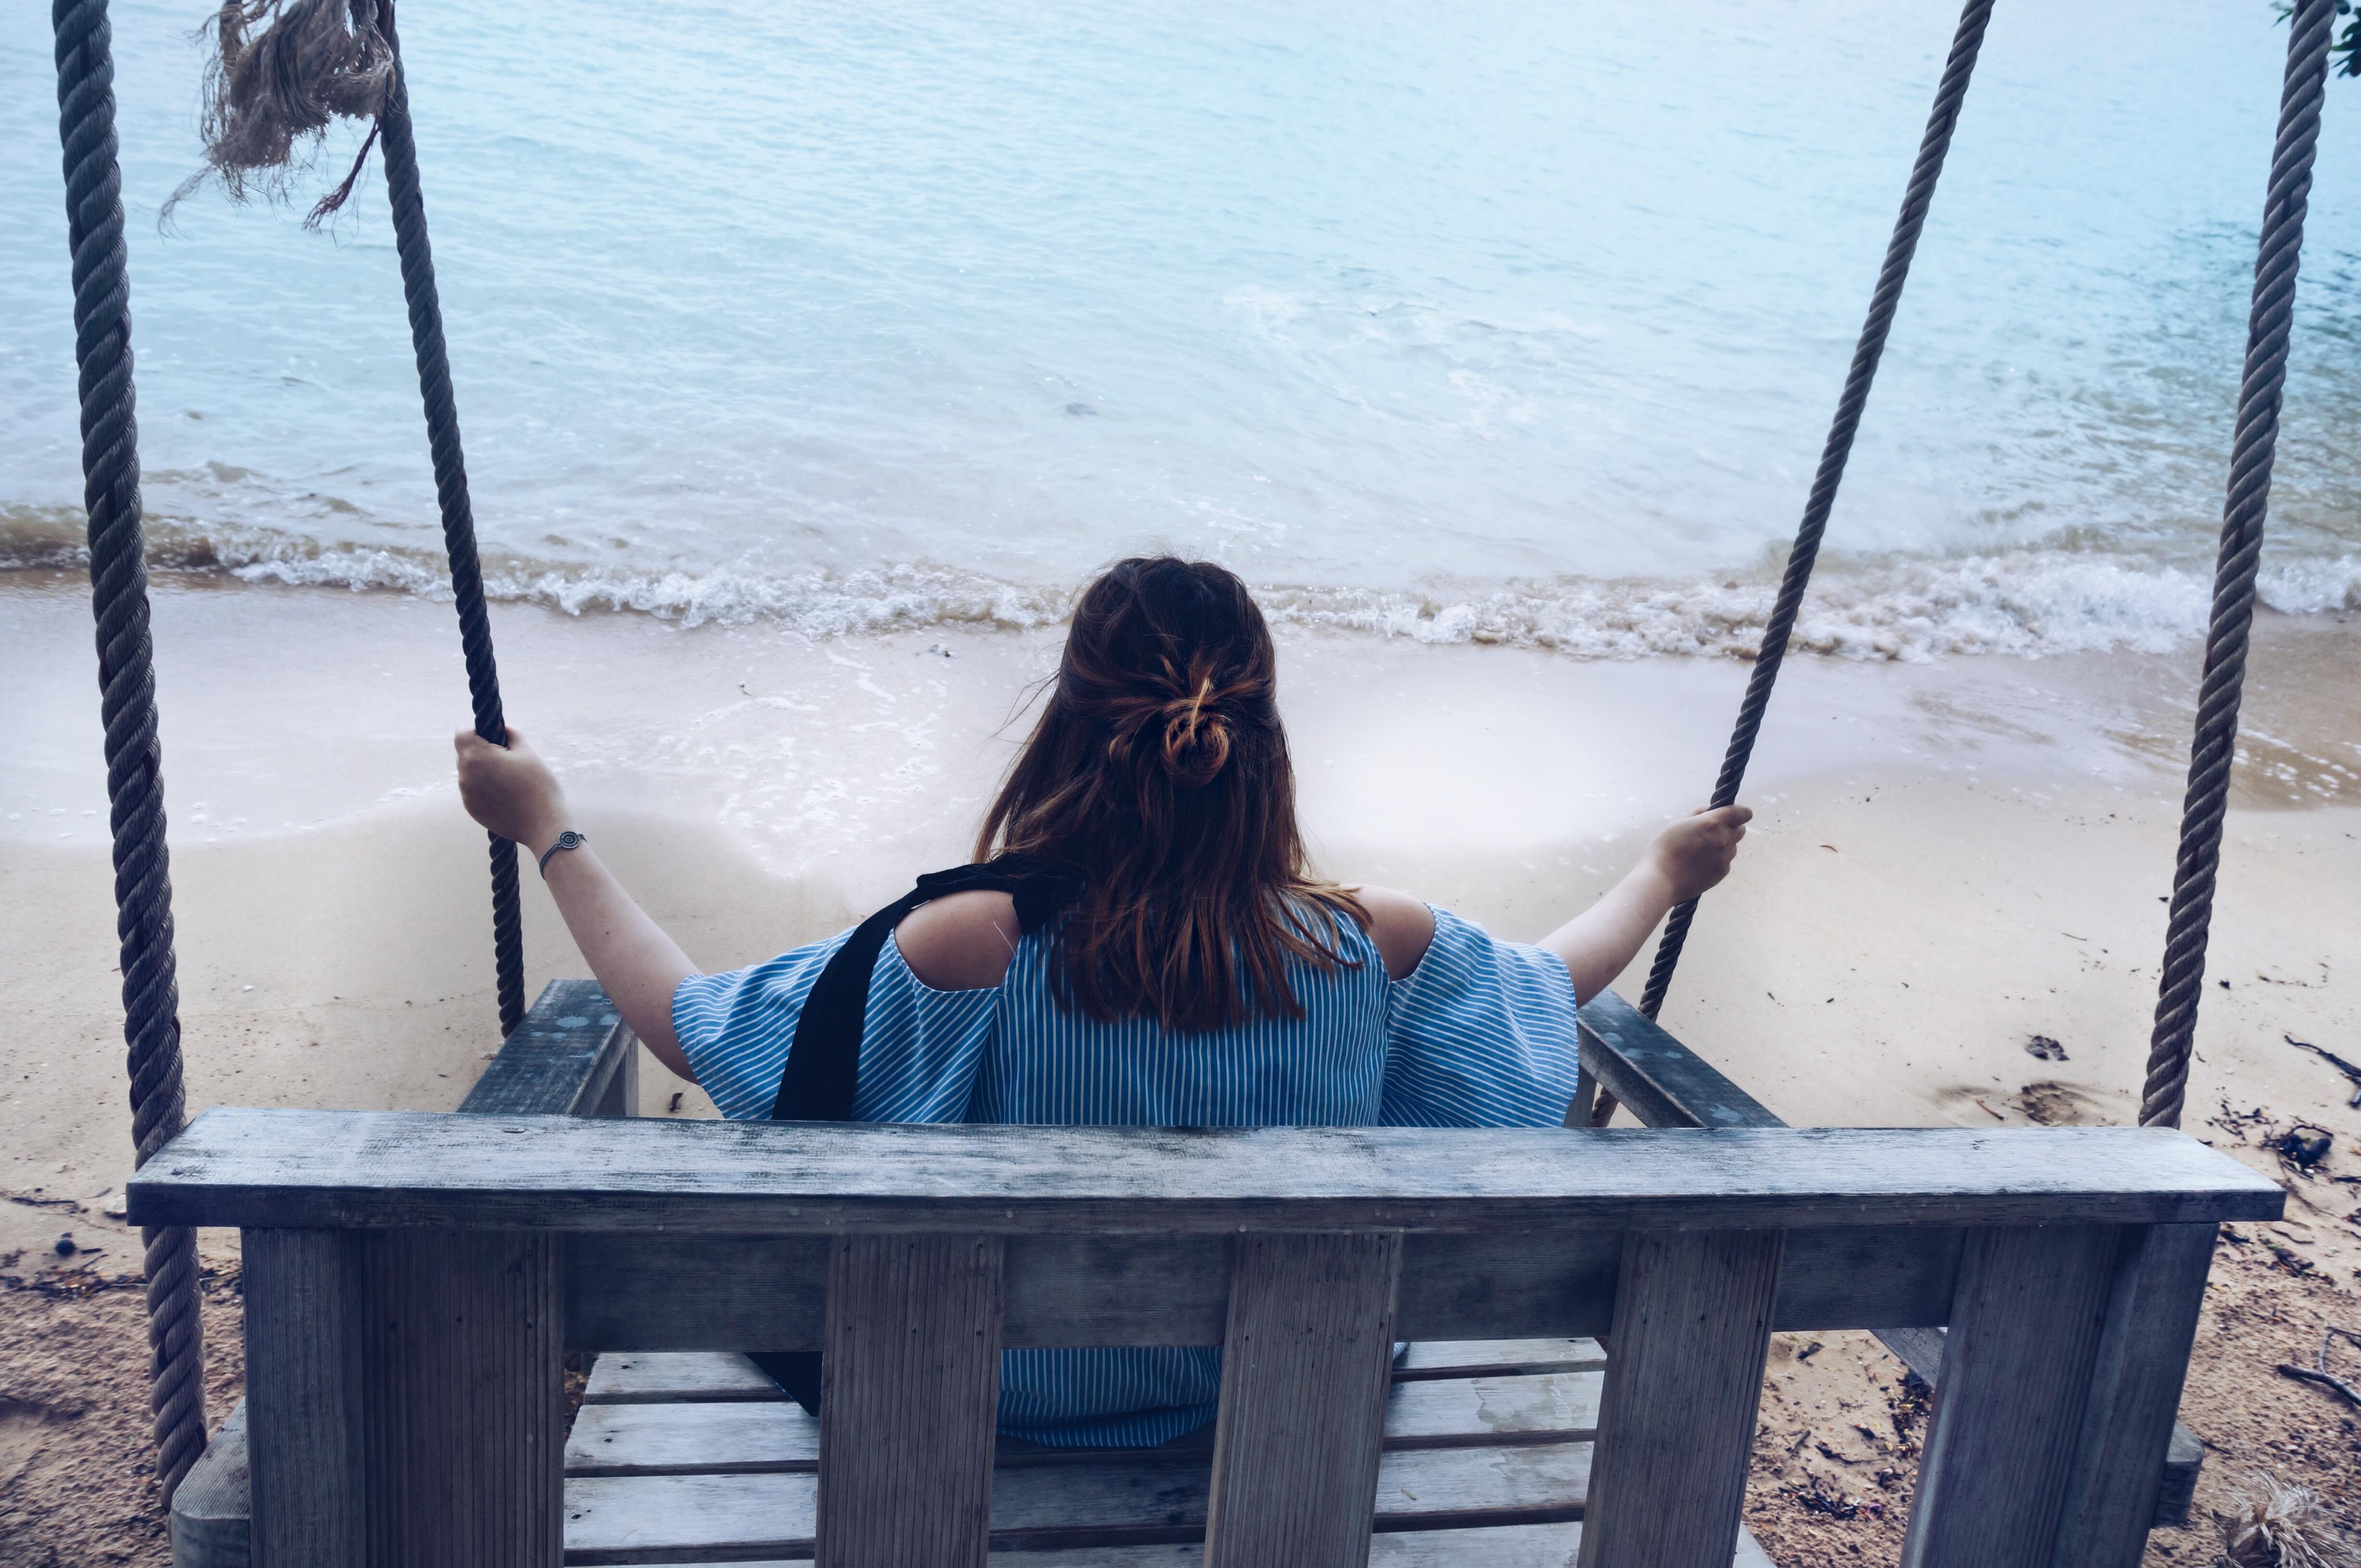 Schaukel am Meer, Thailand besonderes Hotel